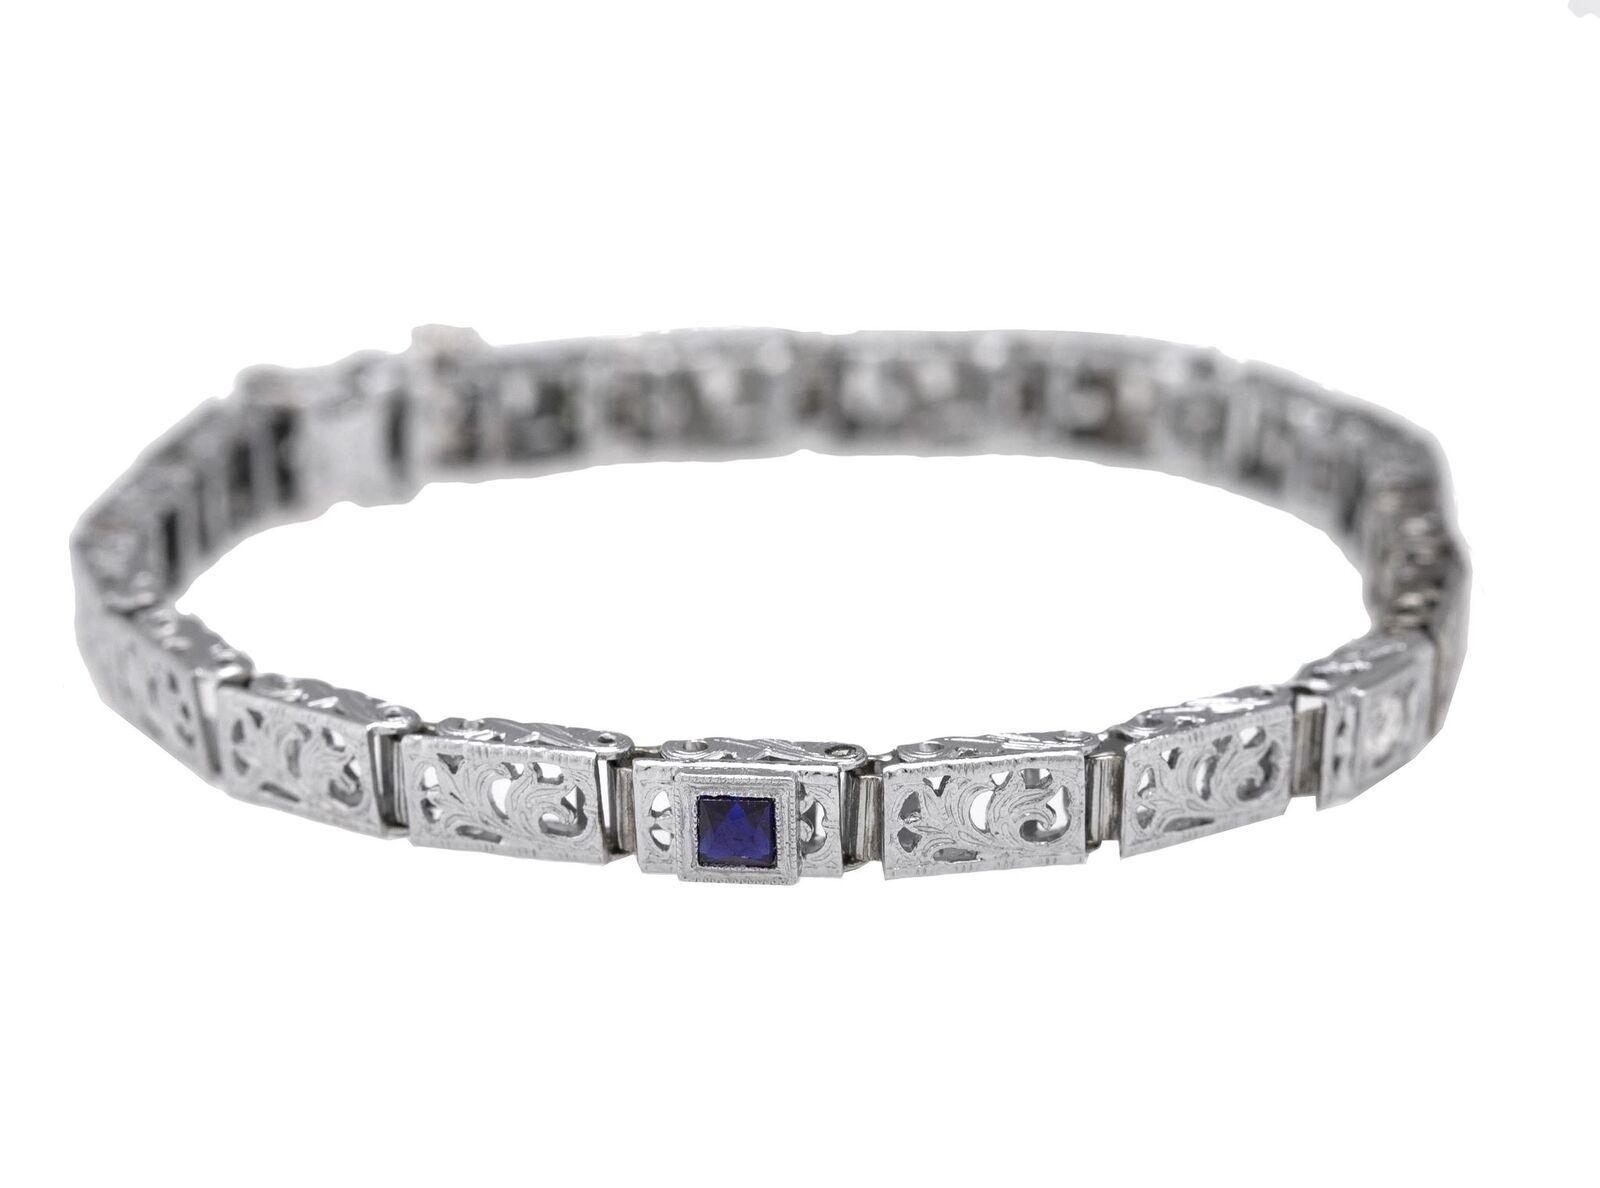 1930s Antique Art Deco 14K White Gold 0.29ctw Sapphire Diamond Filigree Bracelet